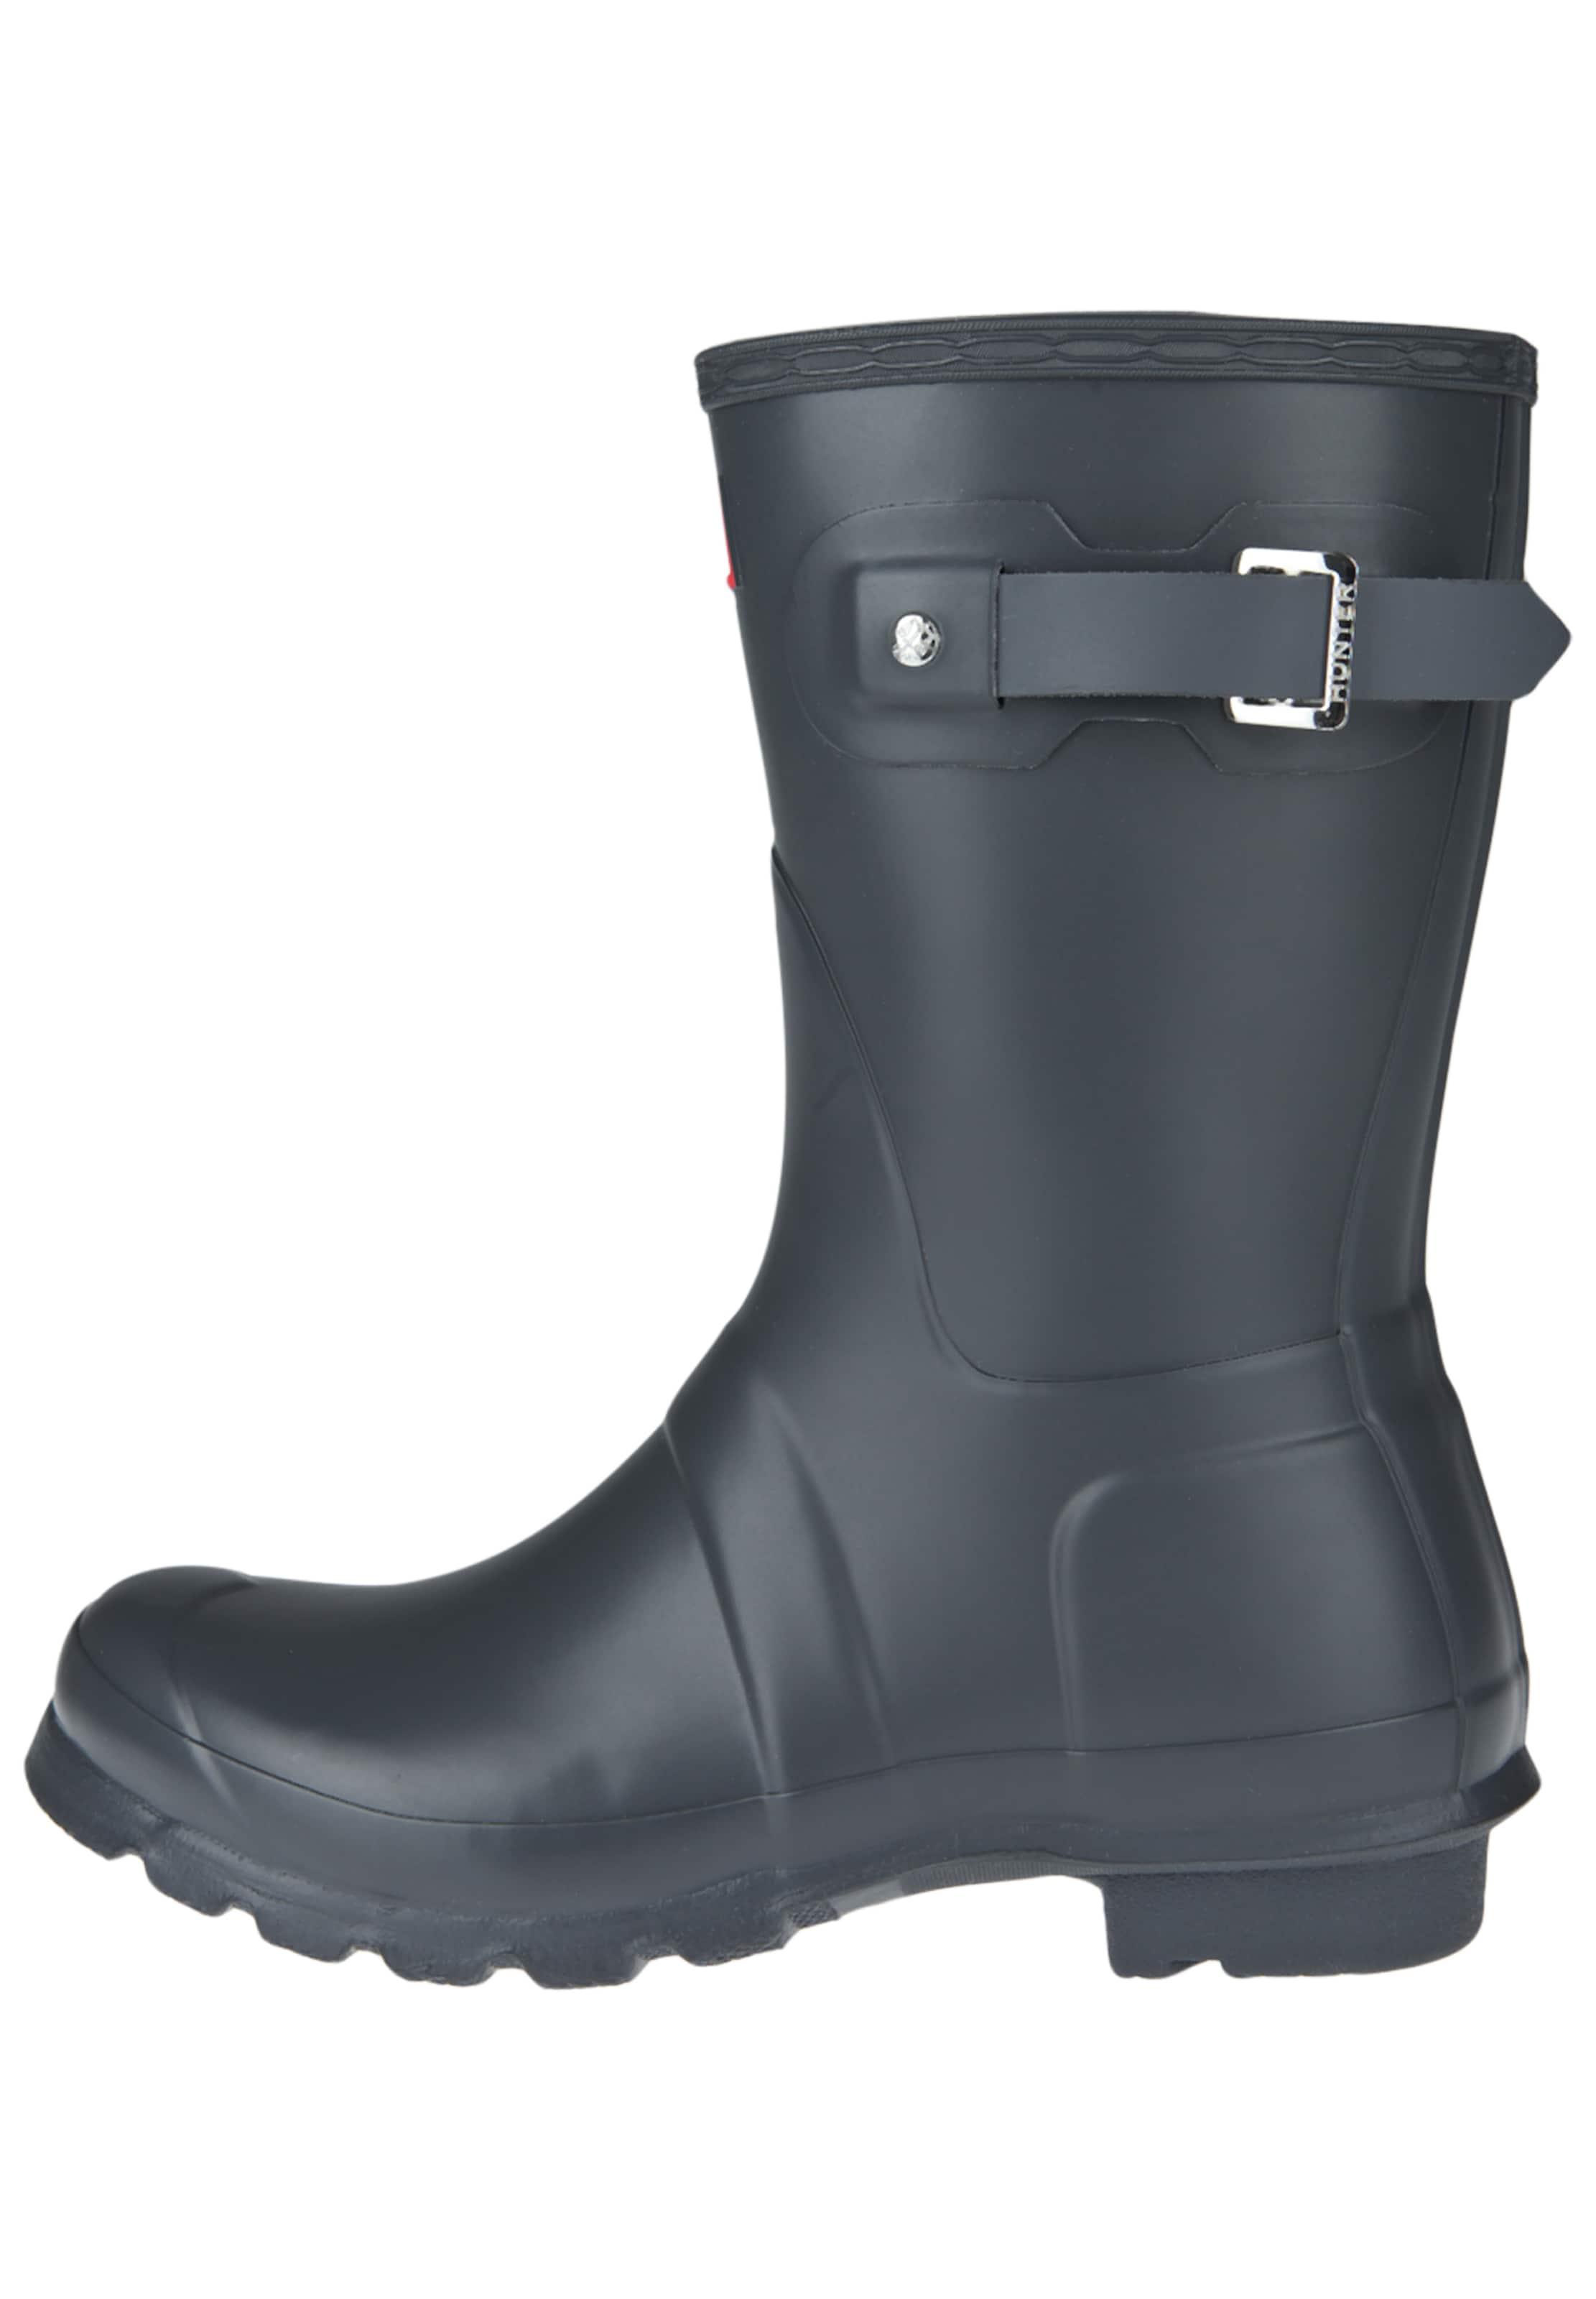 HUNTER Gummstiefel ORIGINAL SHORT Verschleißfeste billige Schuhe